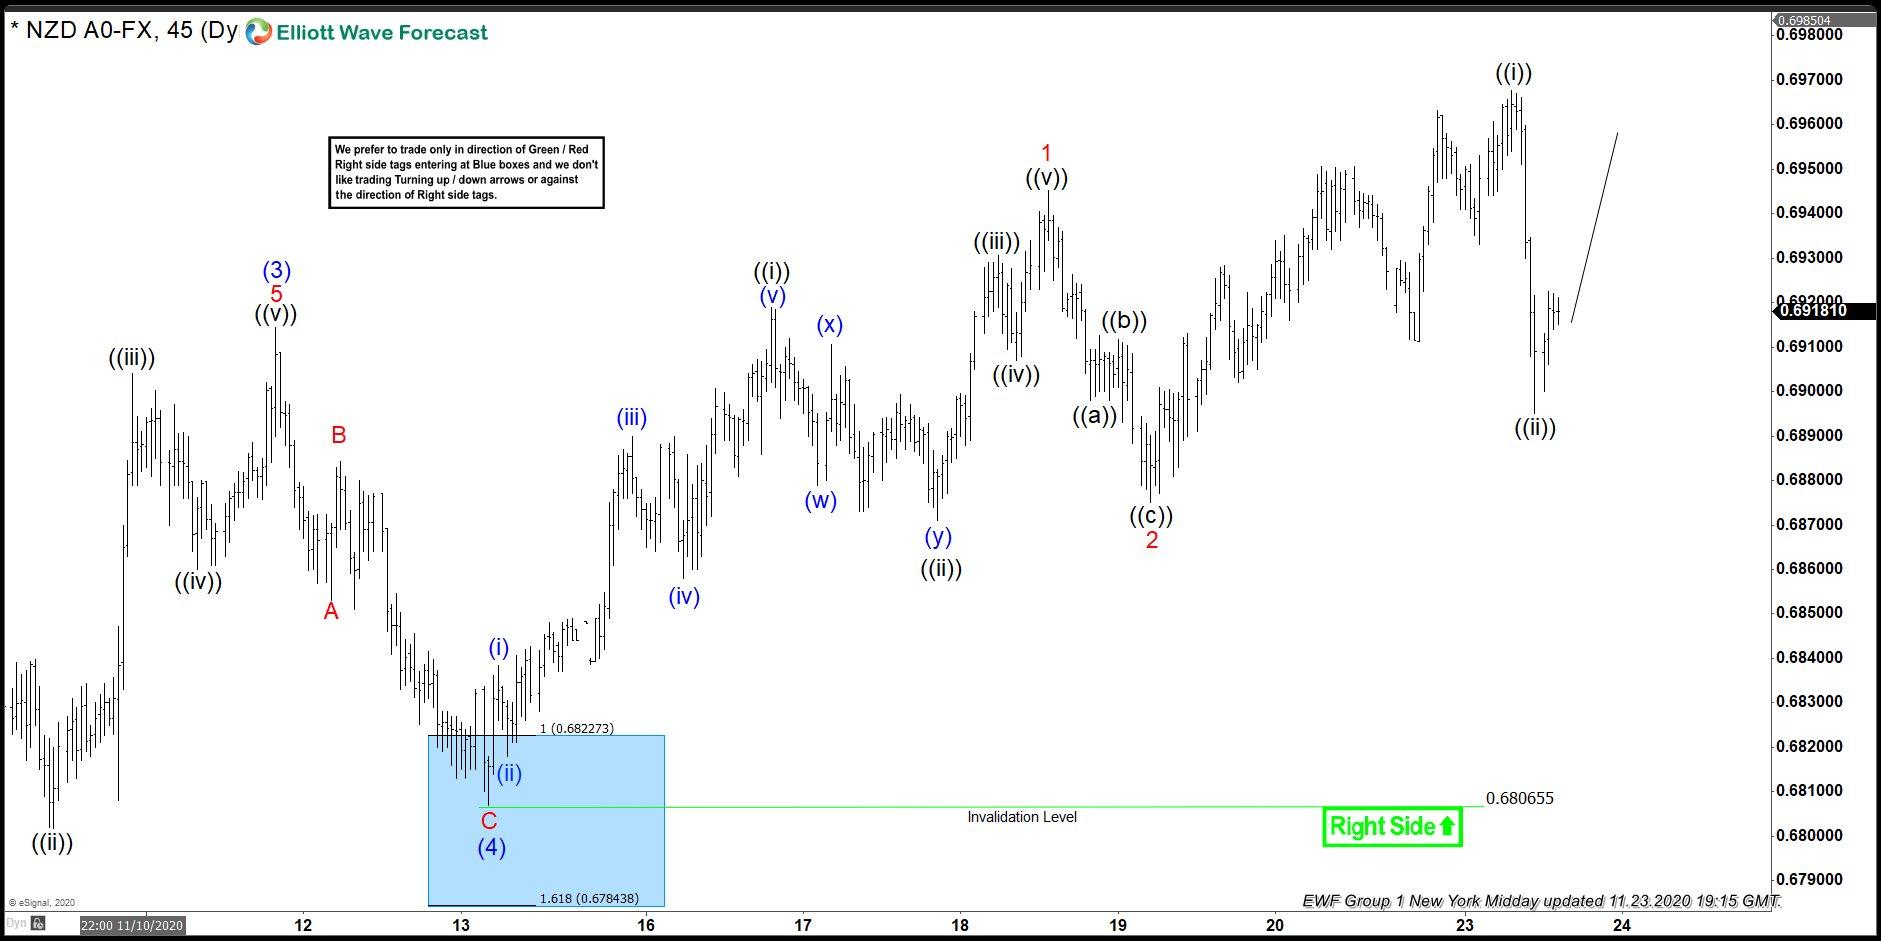 NZDUSD 23 November 1 Hour Elliott Wave Analysis